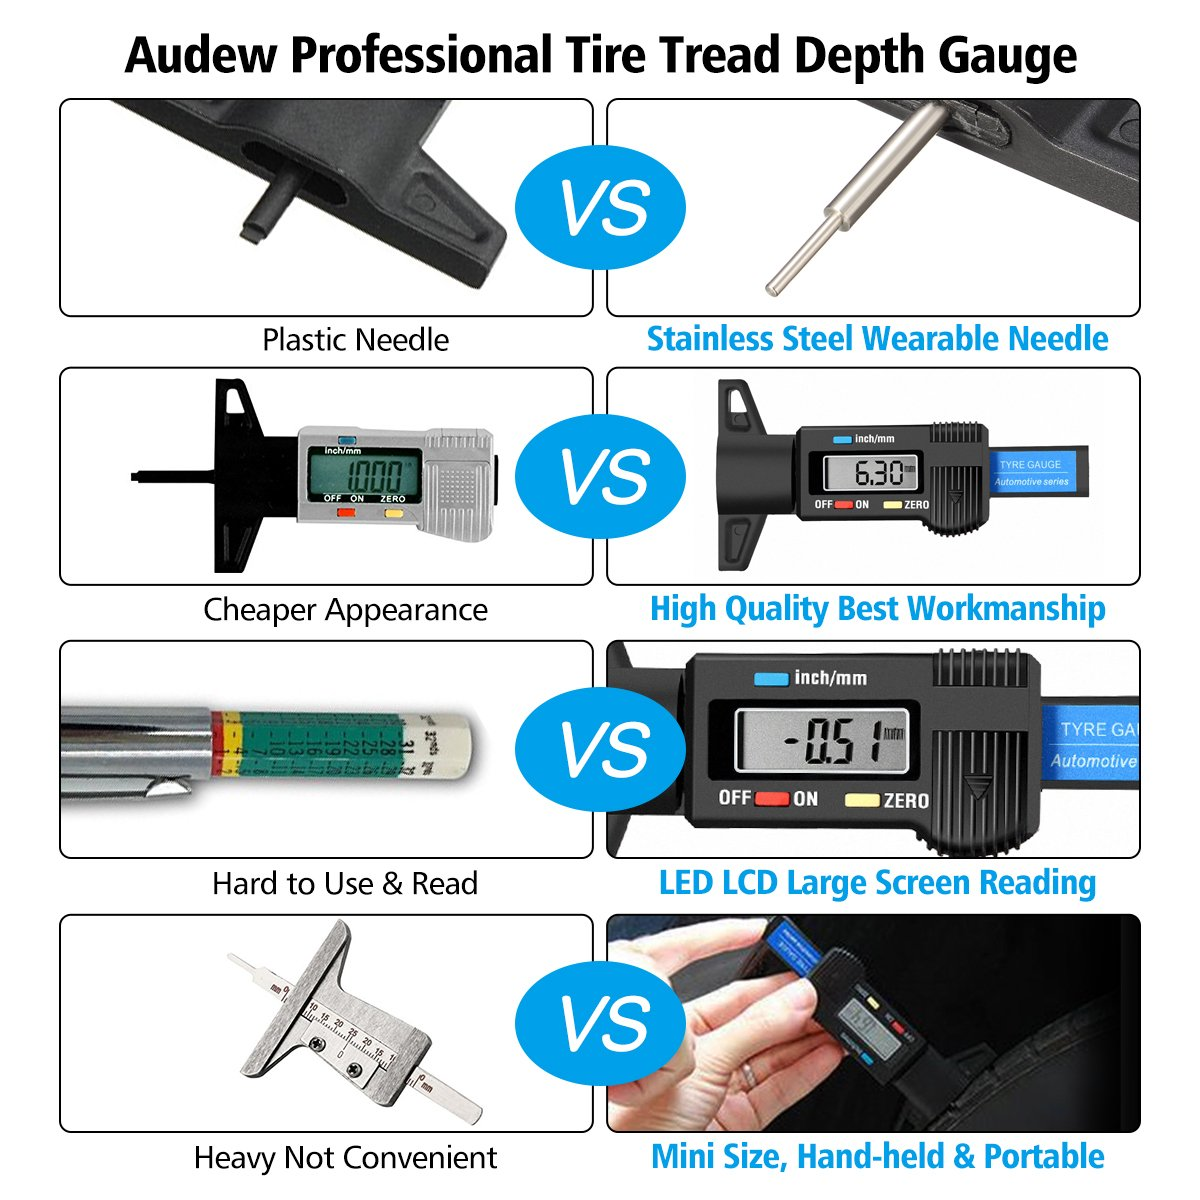 Audew Digital Tire Tread Depth Gauge - Digital Tire Gauge Meter Measurer LCD Display Tread Checker Tire Tester for Cars Trucks Vans SUV, Metric Inch Conversion 0-25.4mm by Audew (Image #7)